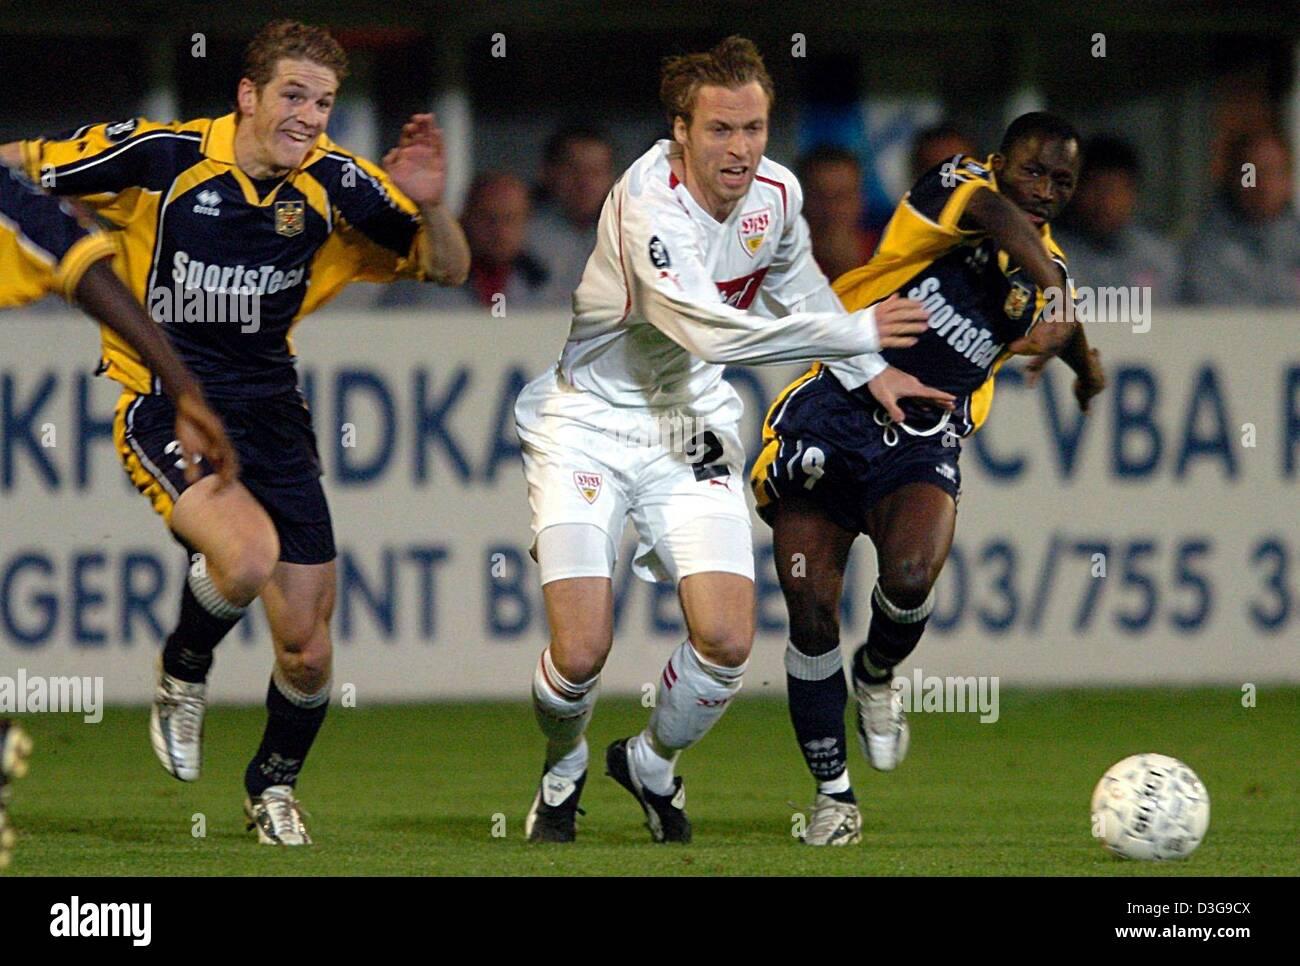 (dpa) - Beveren's players Kristof Lardenoit (L) and Badjan Kante Seydou (R) fight for the ball with Stuttgart's Stock Photo